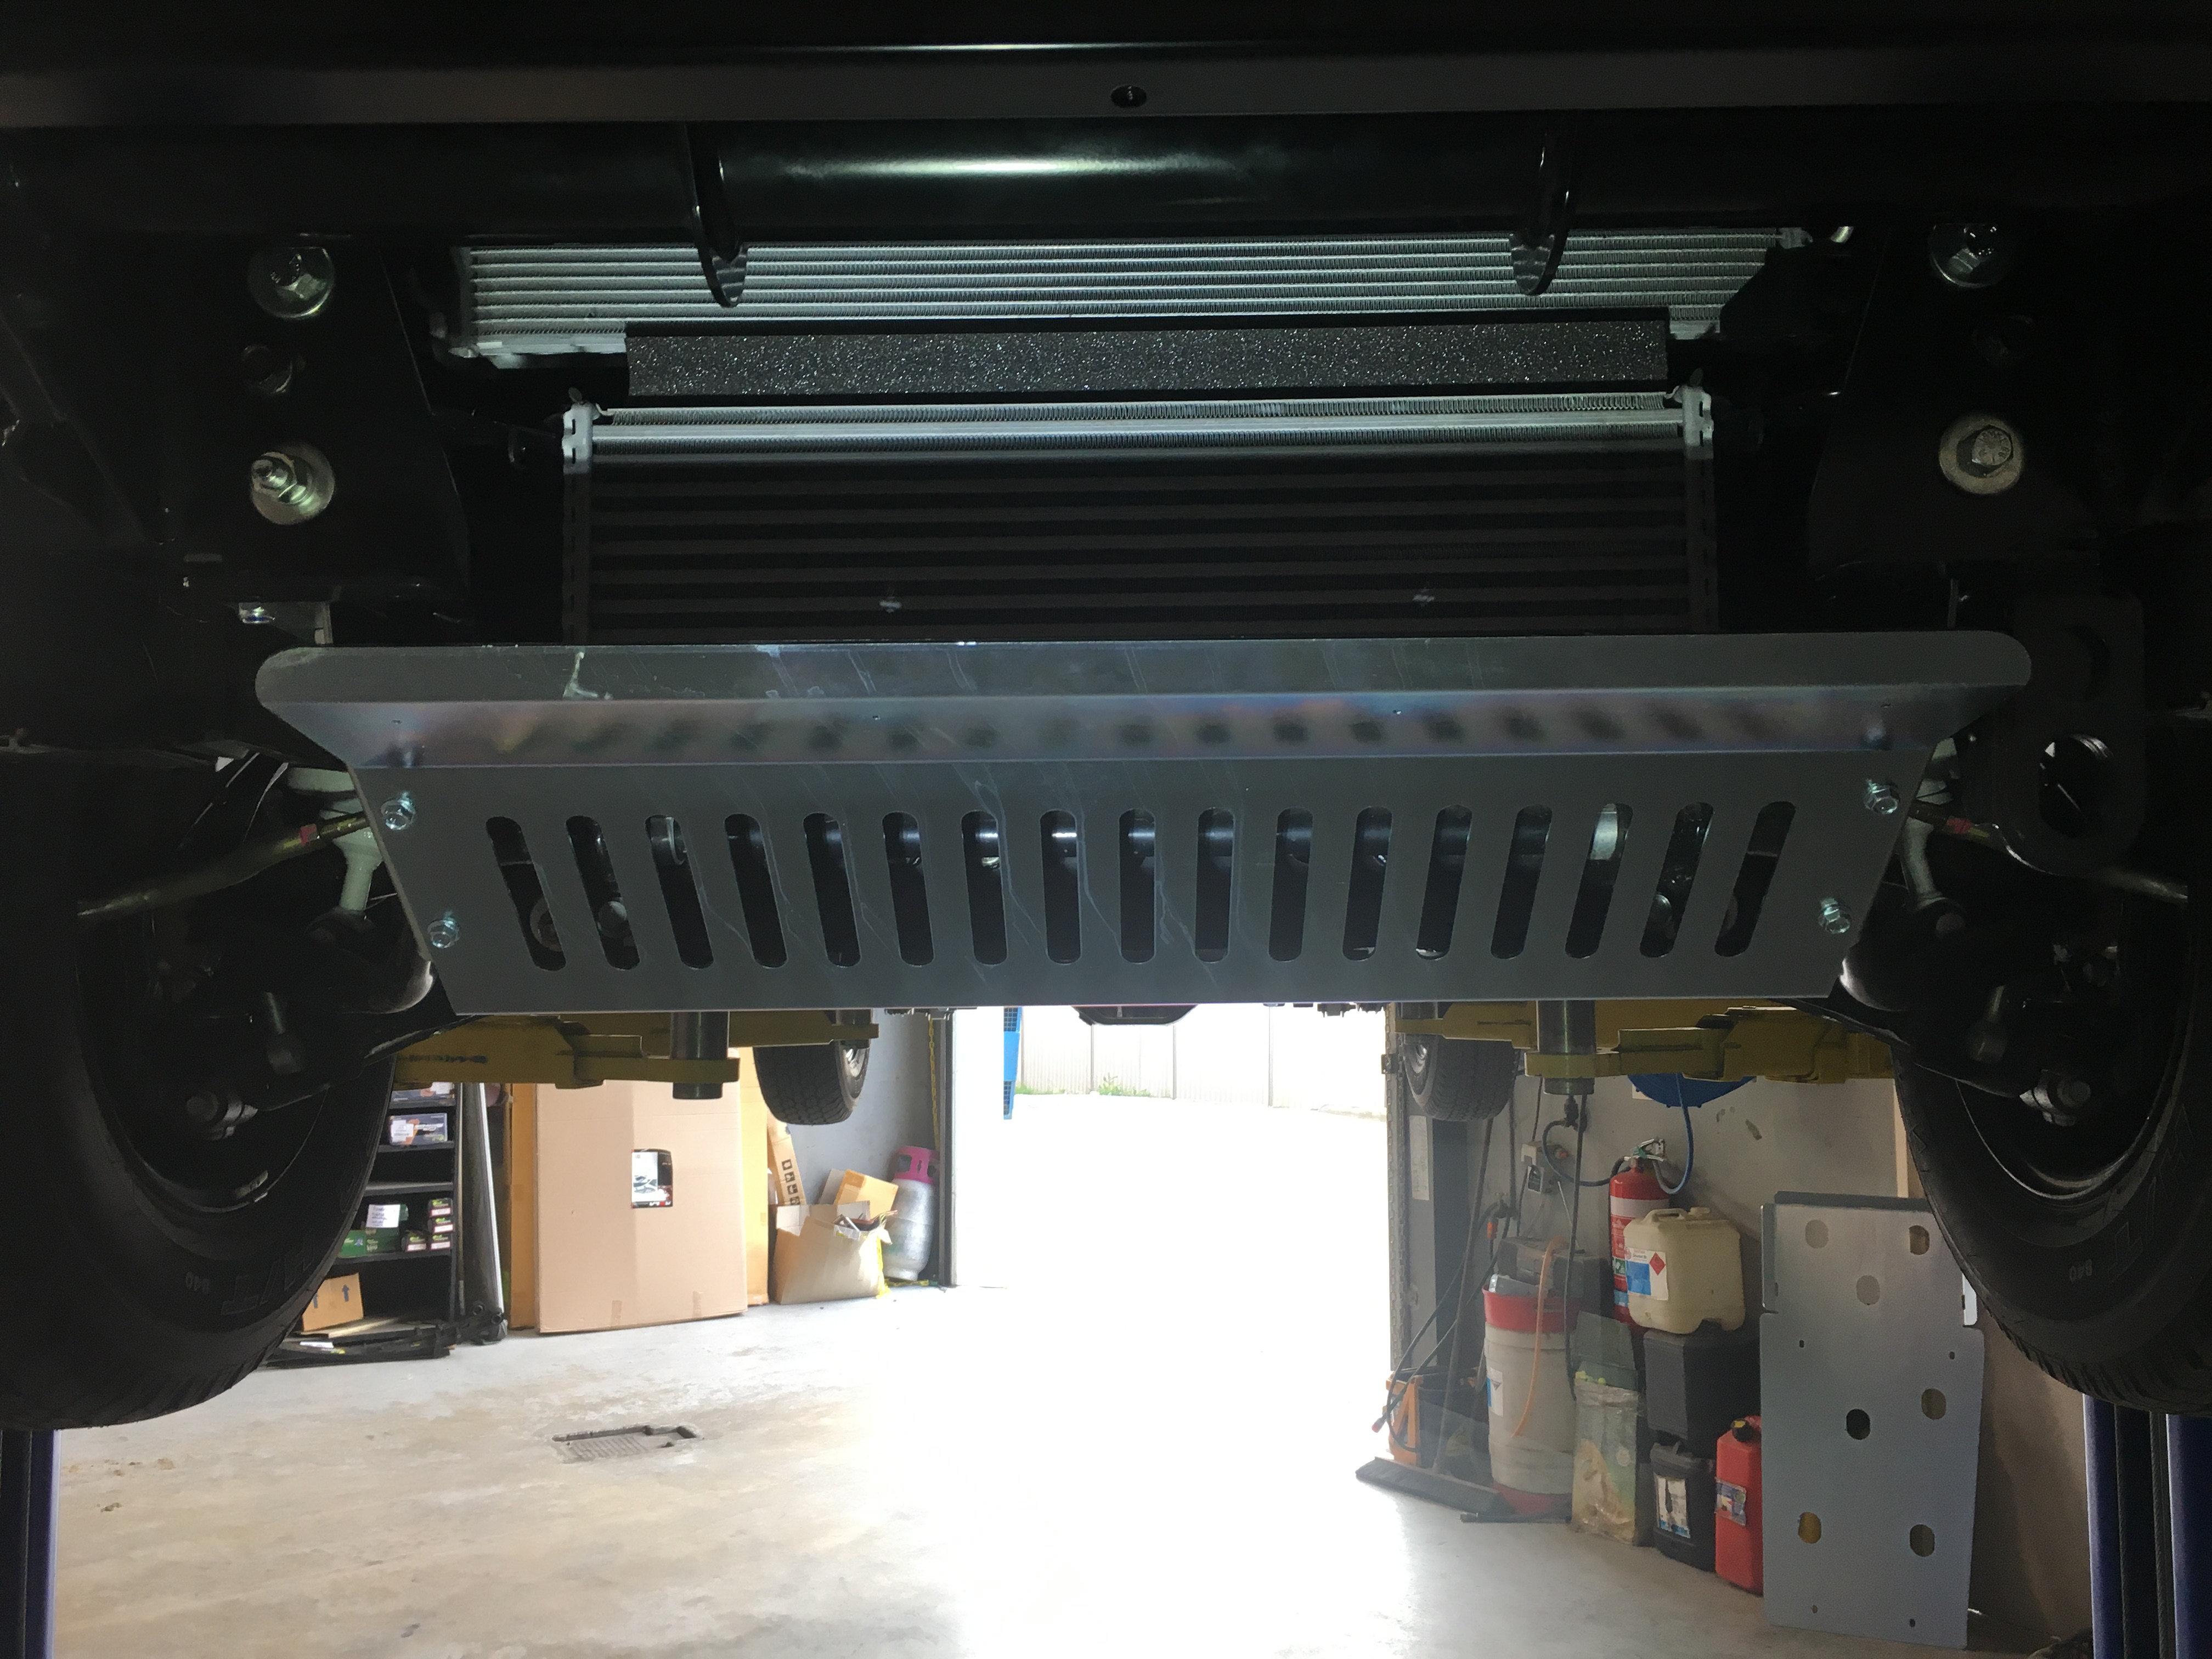 Nissan Navara NP300 2 3 Ltr Diesel Bash Plate code 044 A